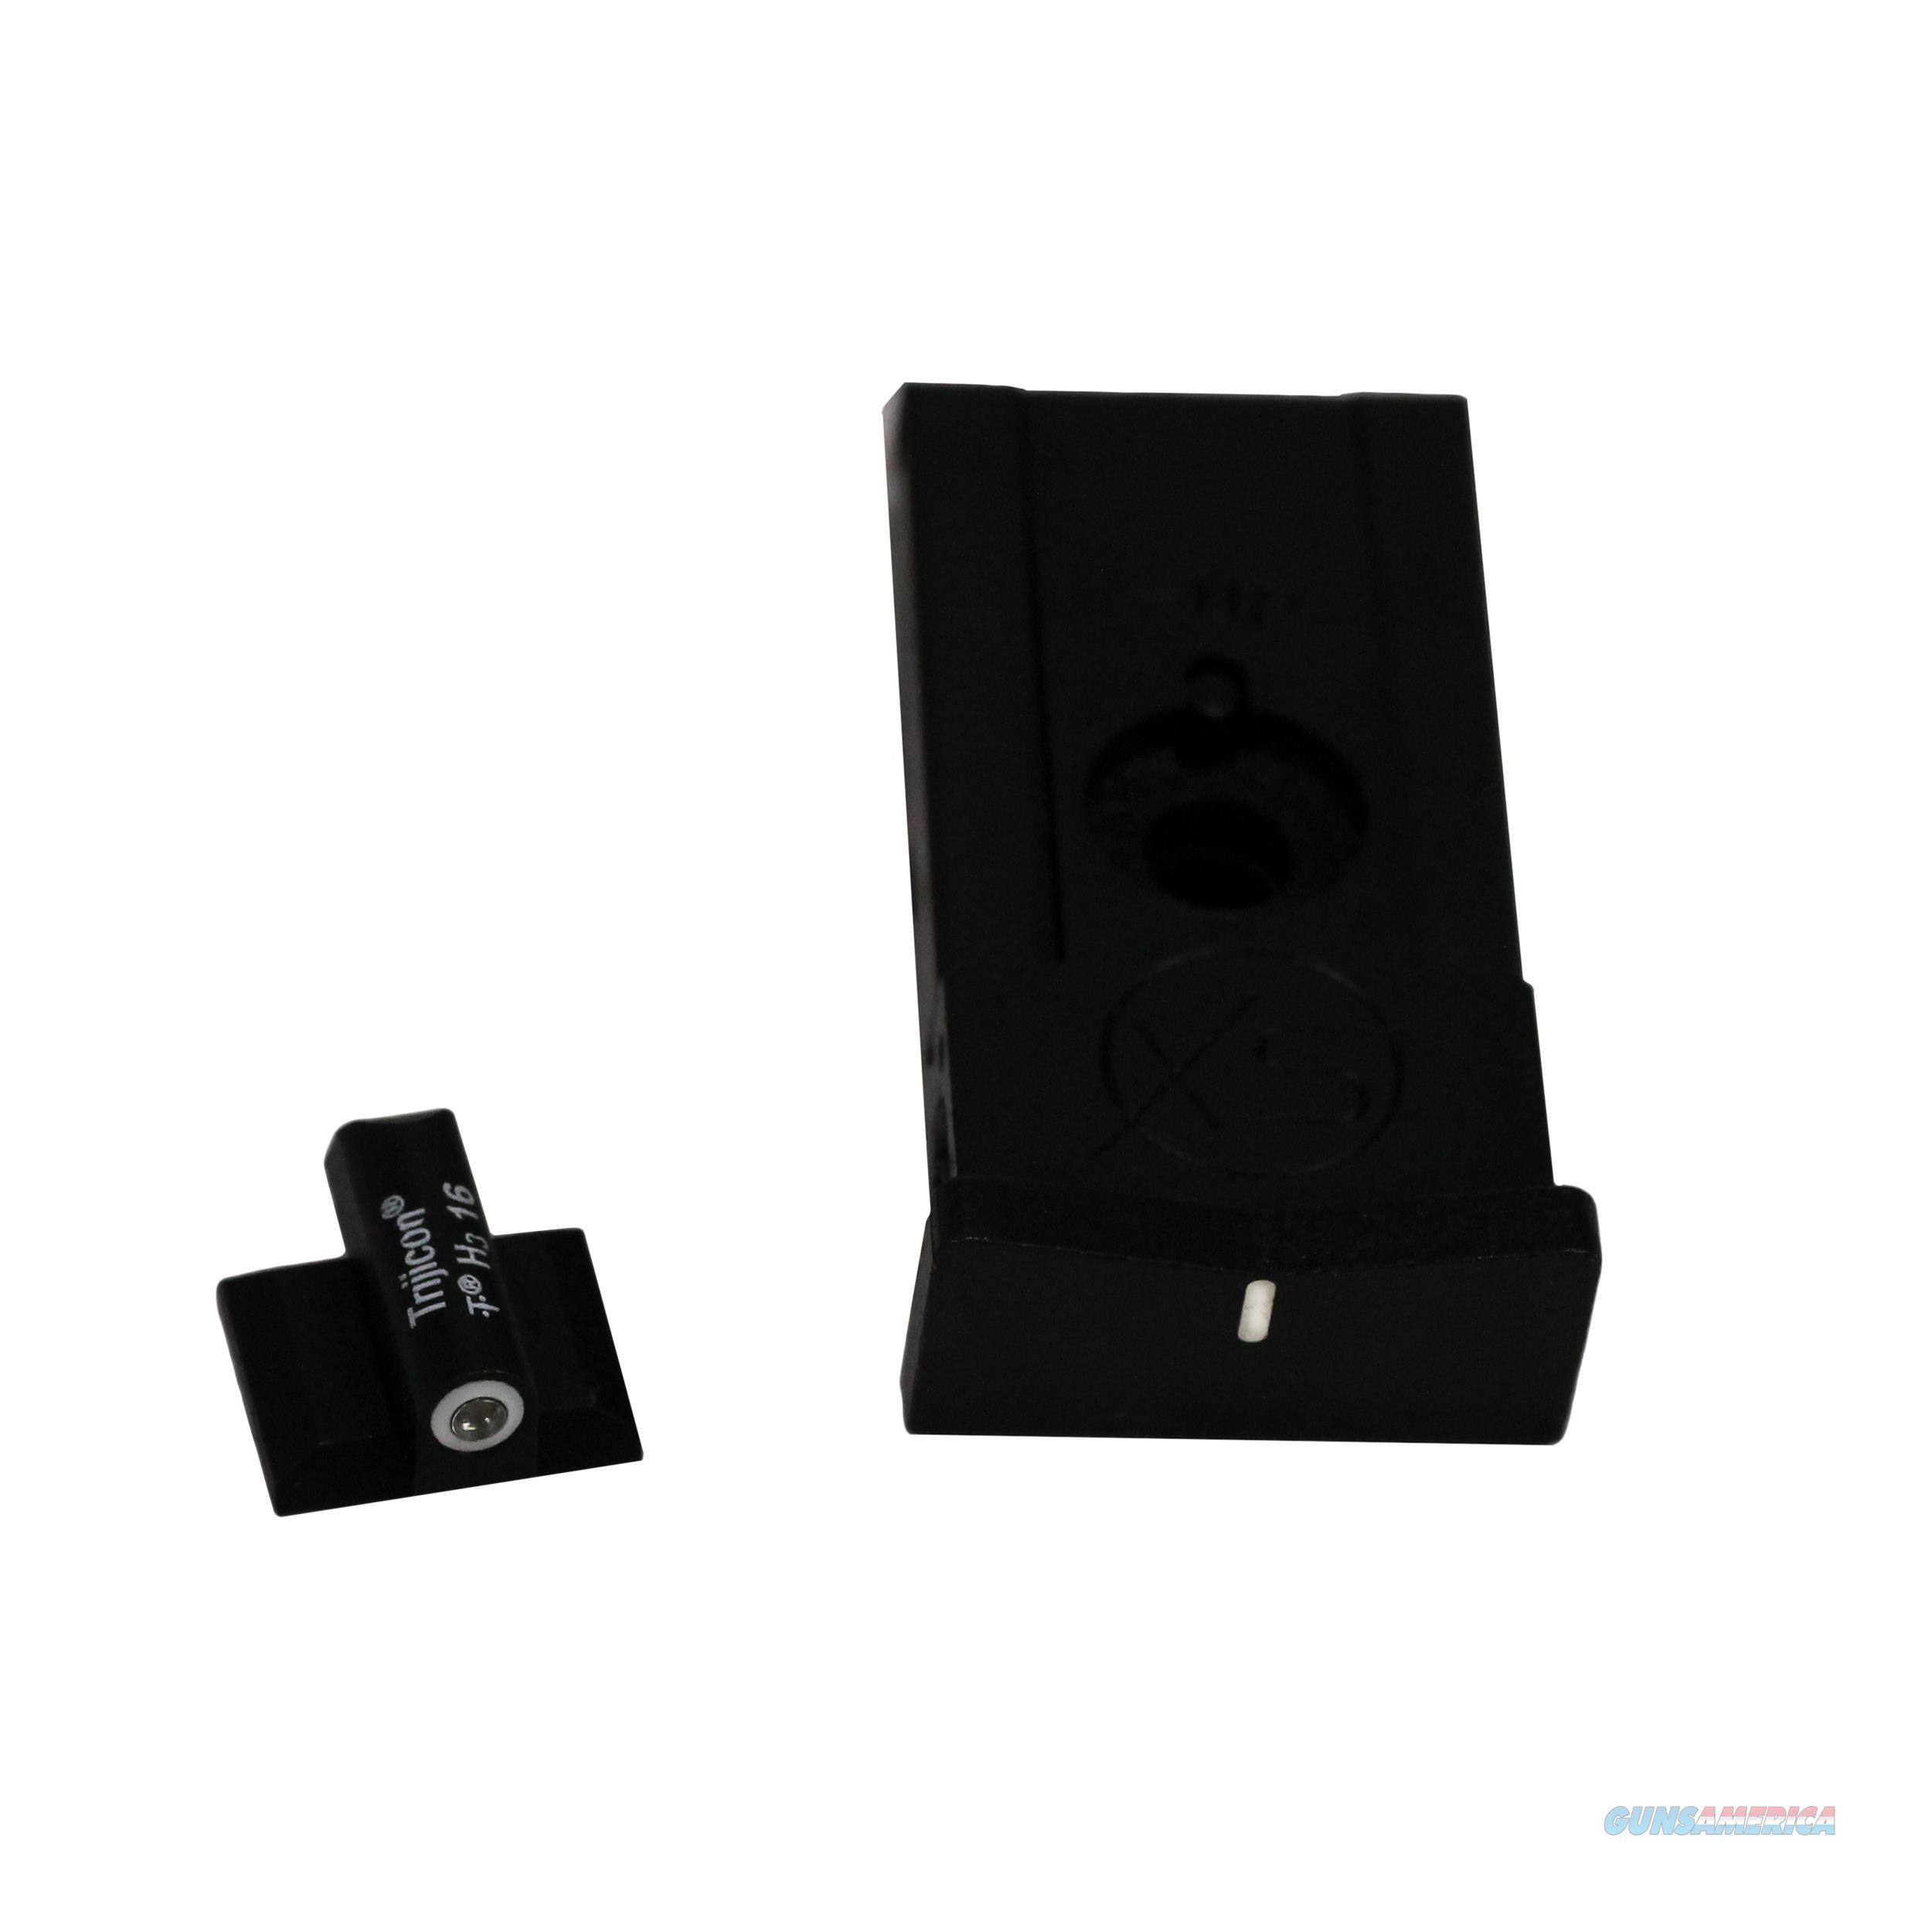 Xs Sights Dxw Standard Dot SP-0007A-4  Non-Guns > Iron/Metal/Peep Sights